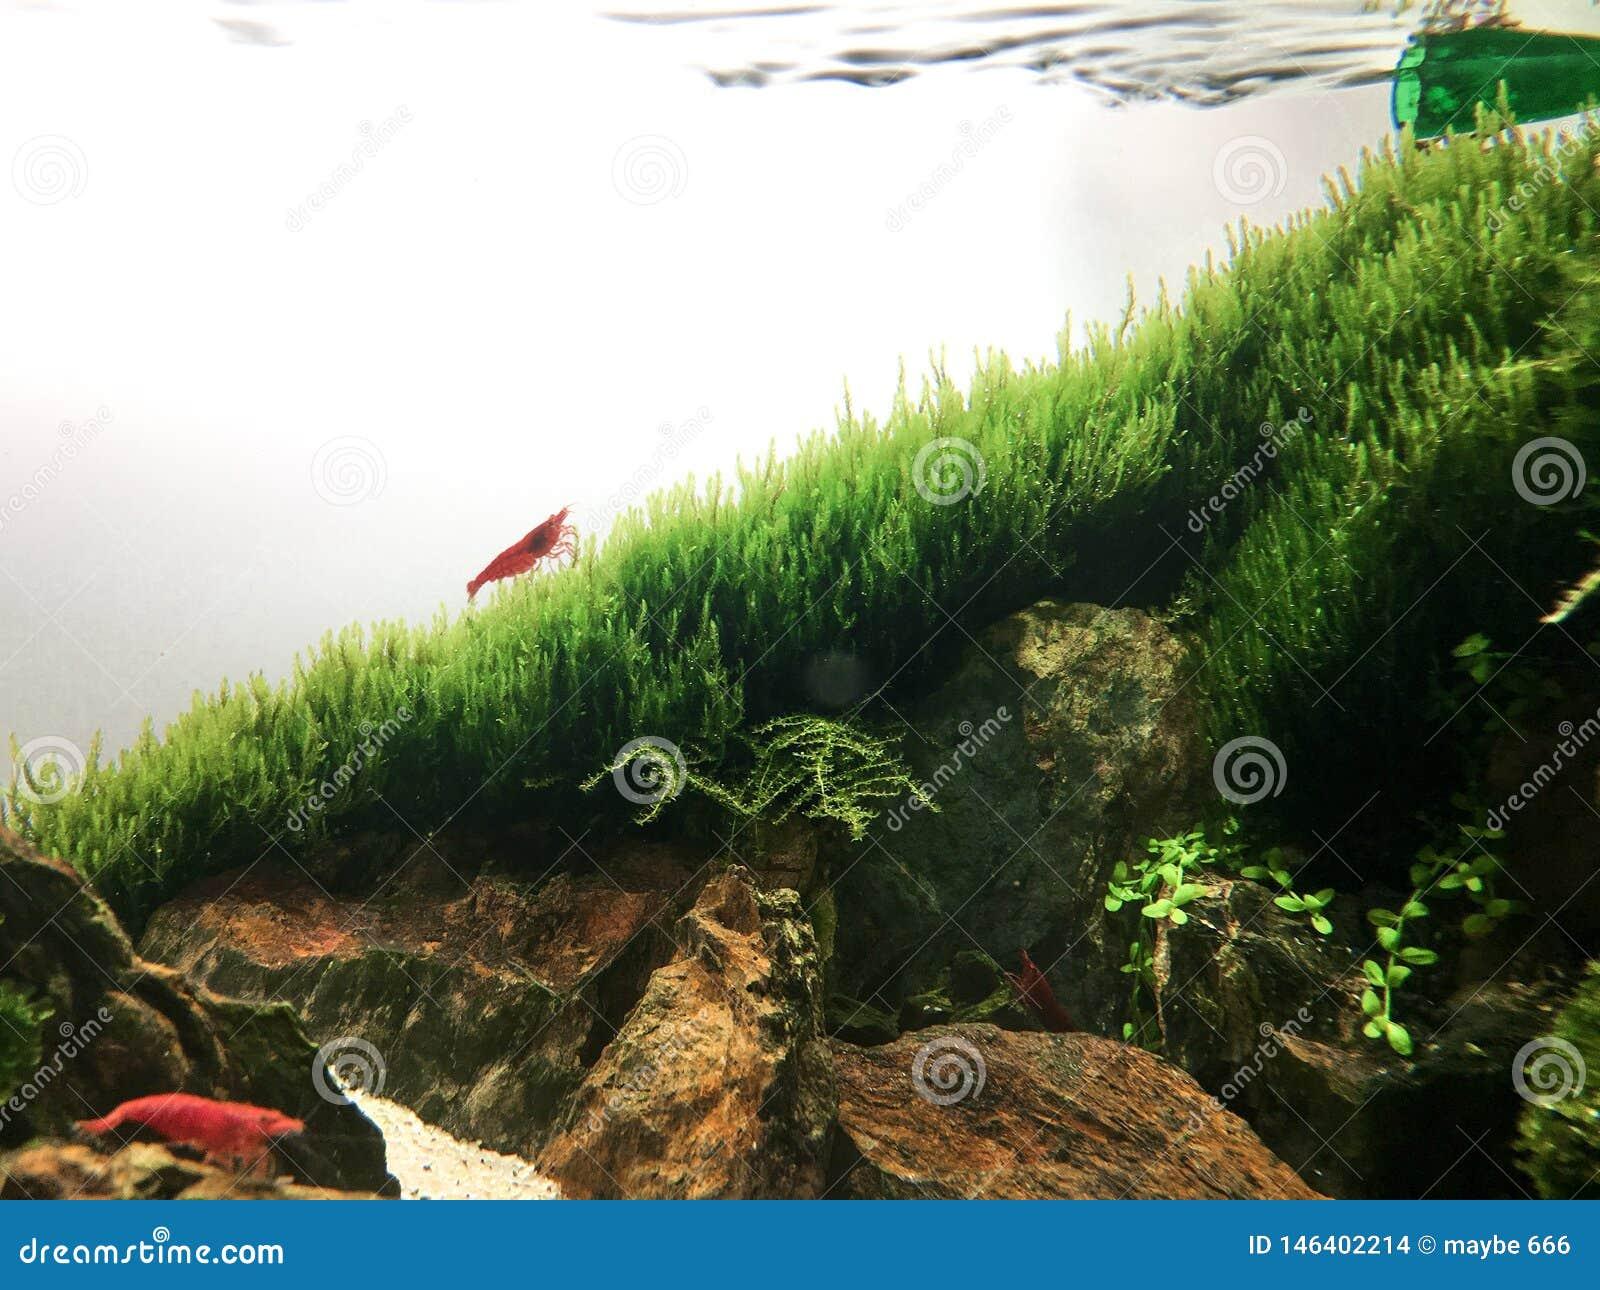 Shrimp Stock Photo Image Of Aquascaping Nanoaquarium 146402214